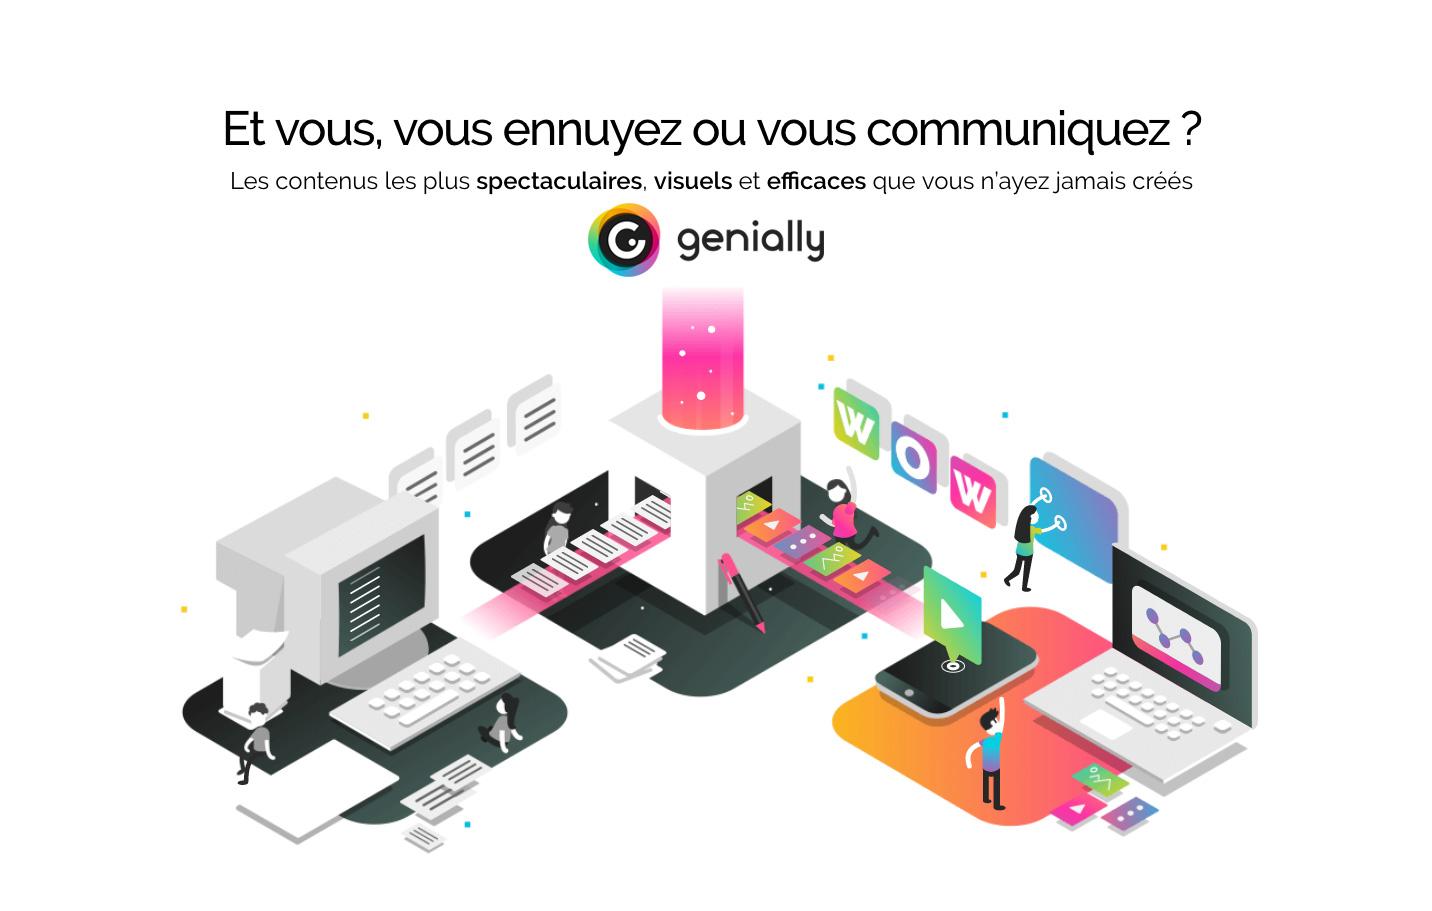 imagen-genially-3.0-francés